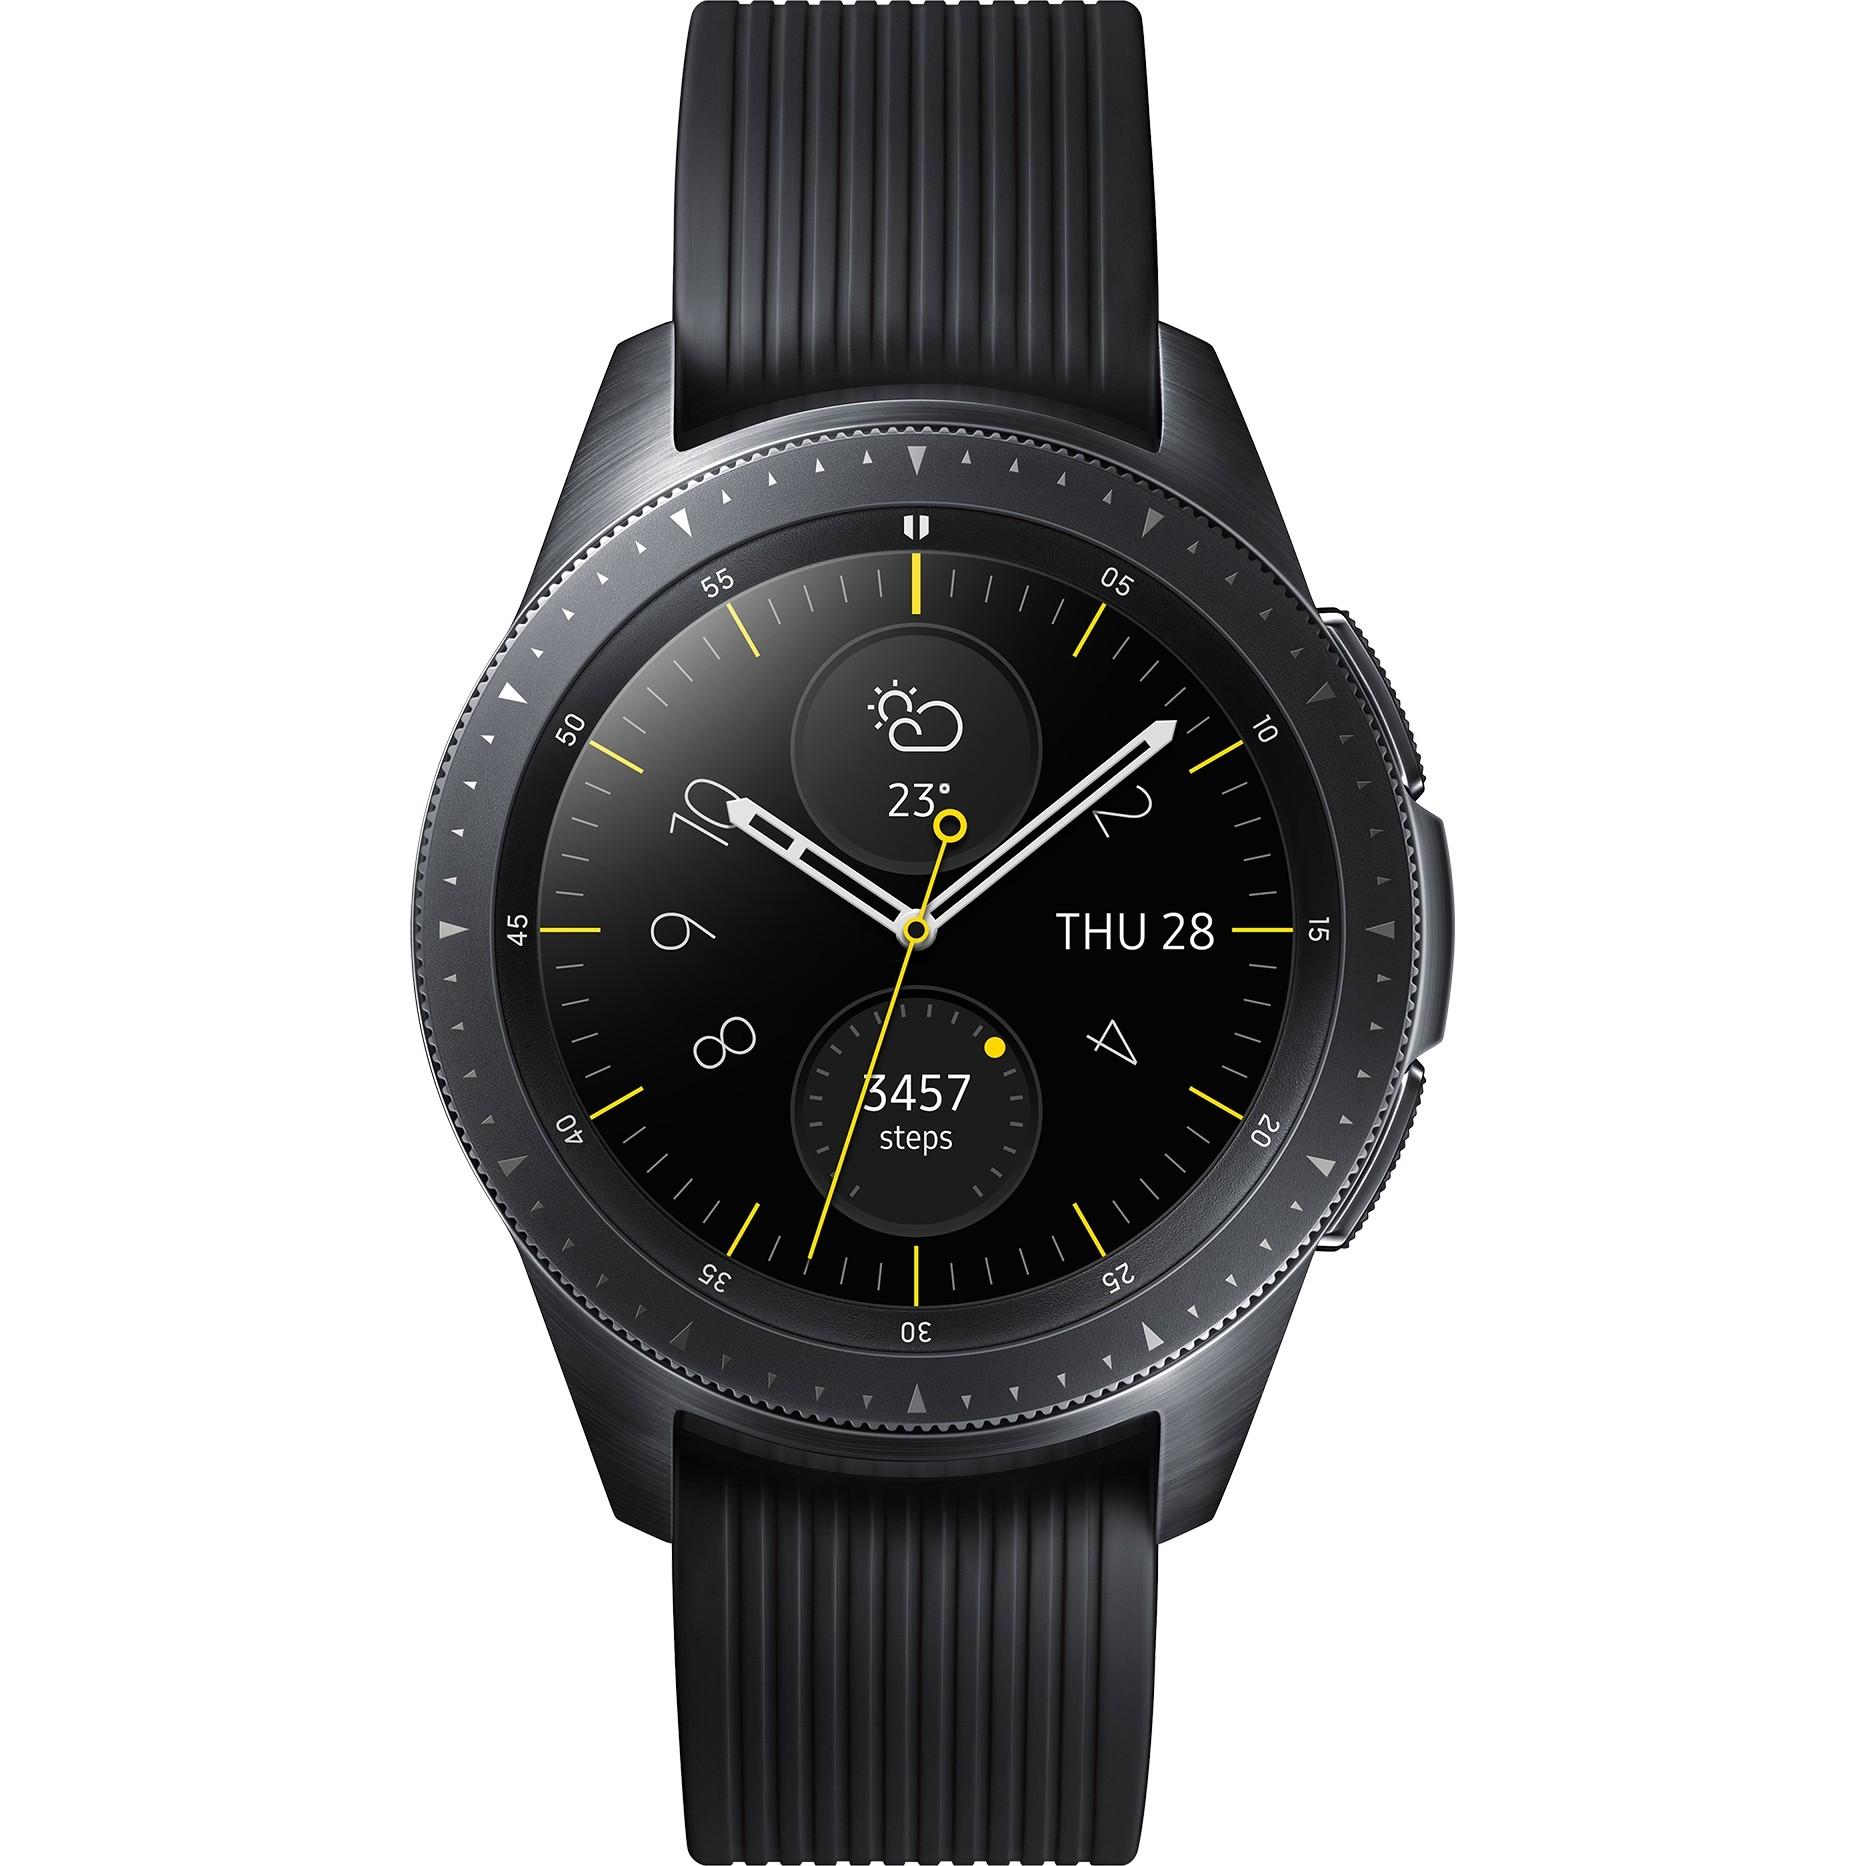 Купить Смарт-часы и браслеты, Смарт-часы Samsung Galaxy Watch 42mm Midnight Black (SM-R810NZKA)